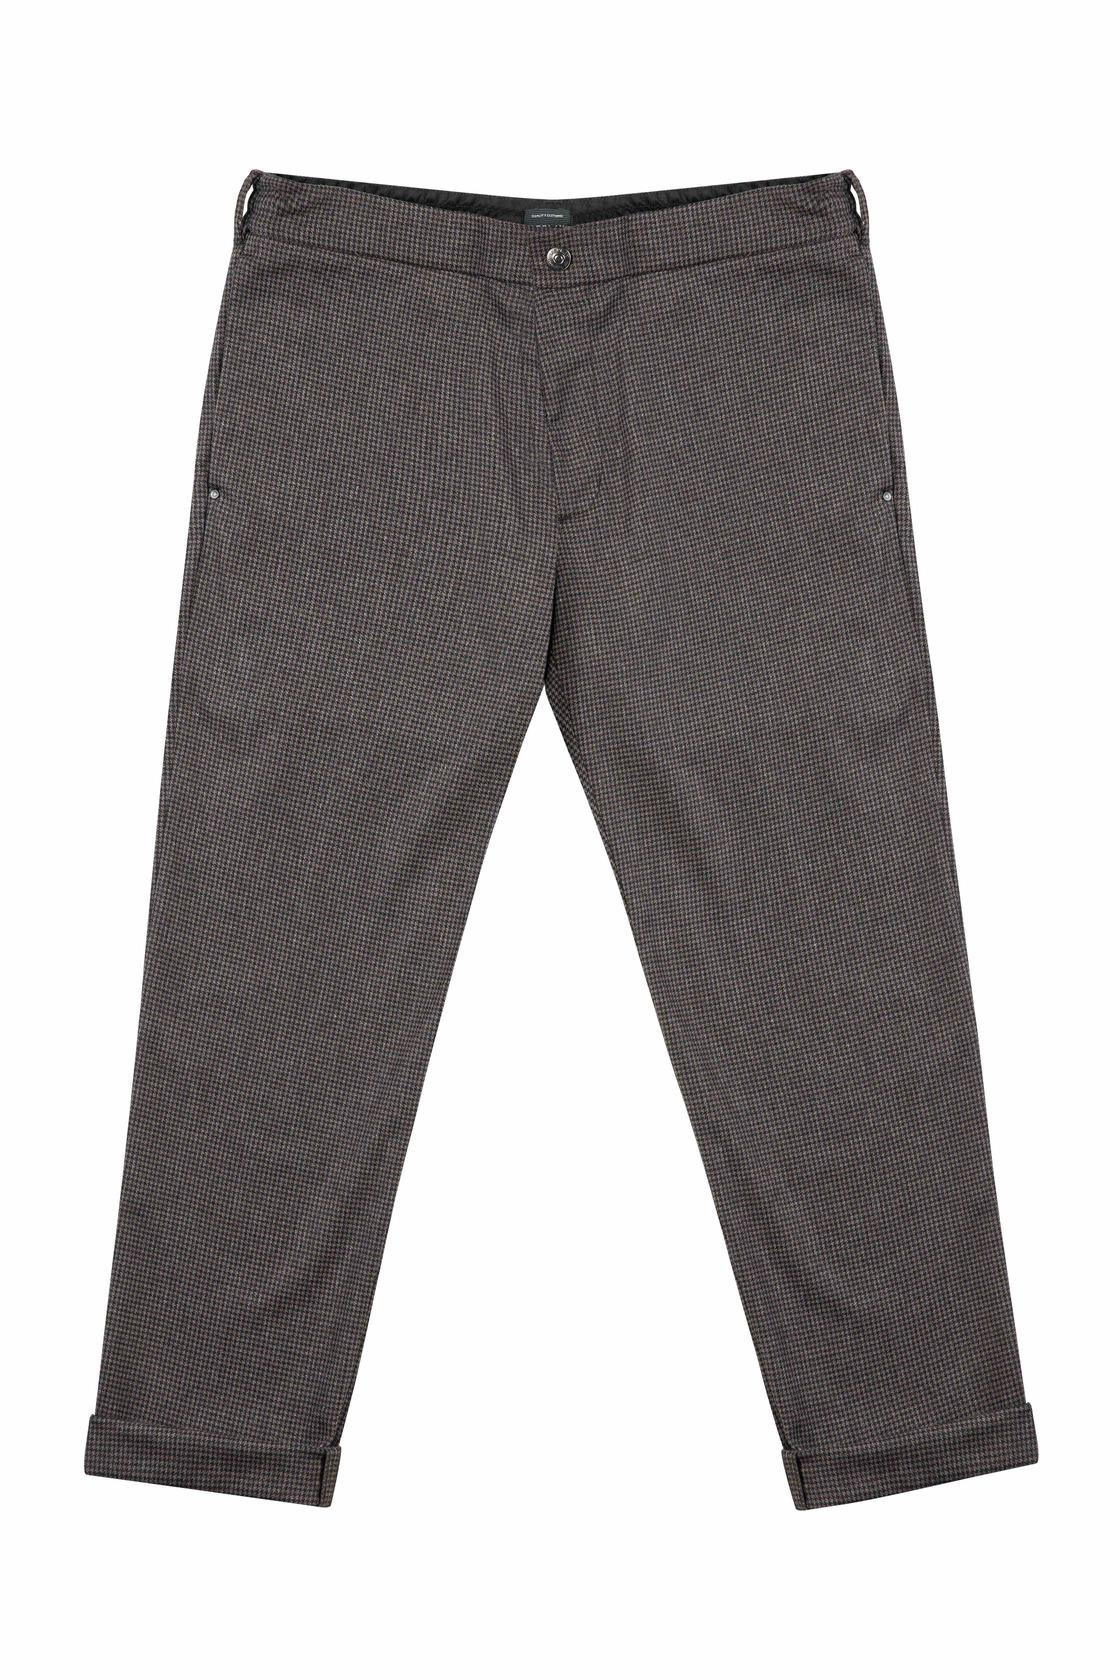 Replay-pantaloni-casual-marrone